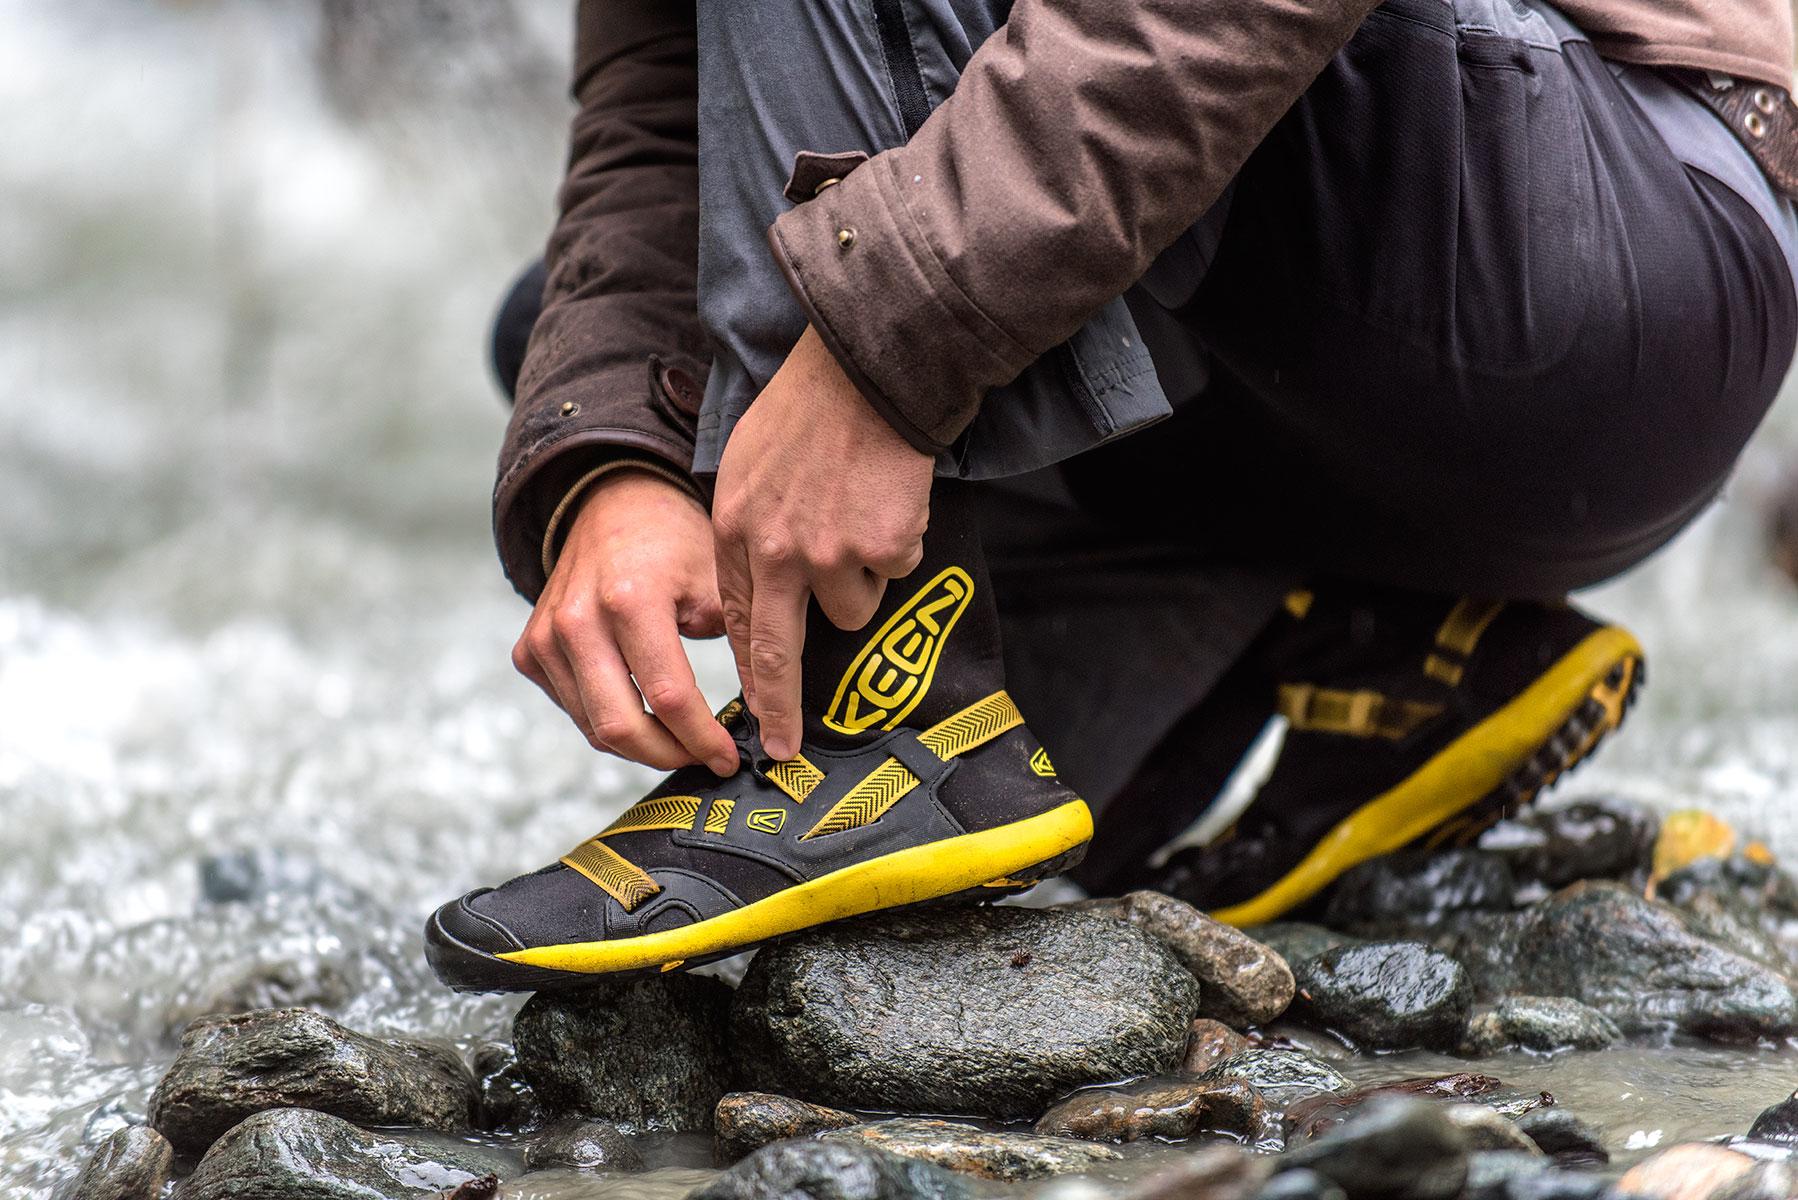 austin-trigg-brave-wilderness-alaska-BW-Coyote-Clips-Keen-water-boots.jpg